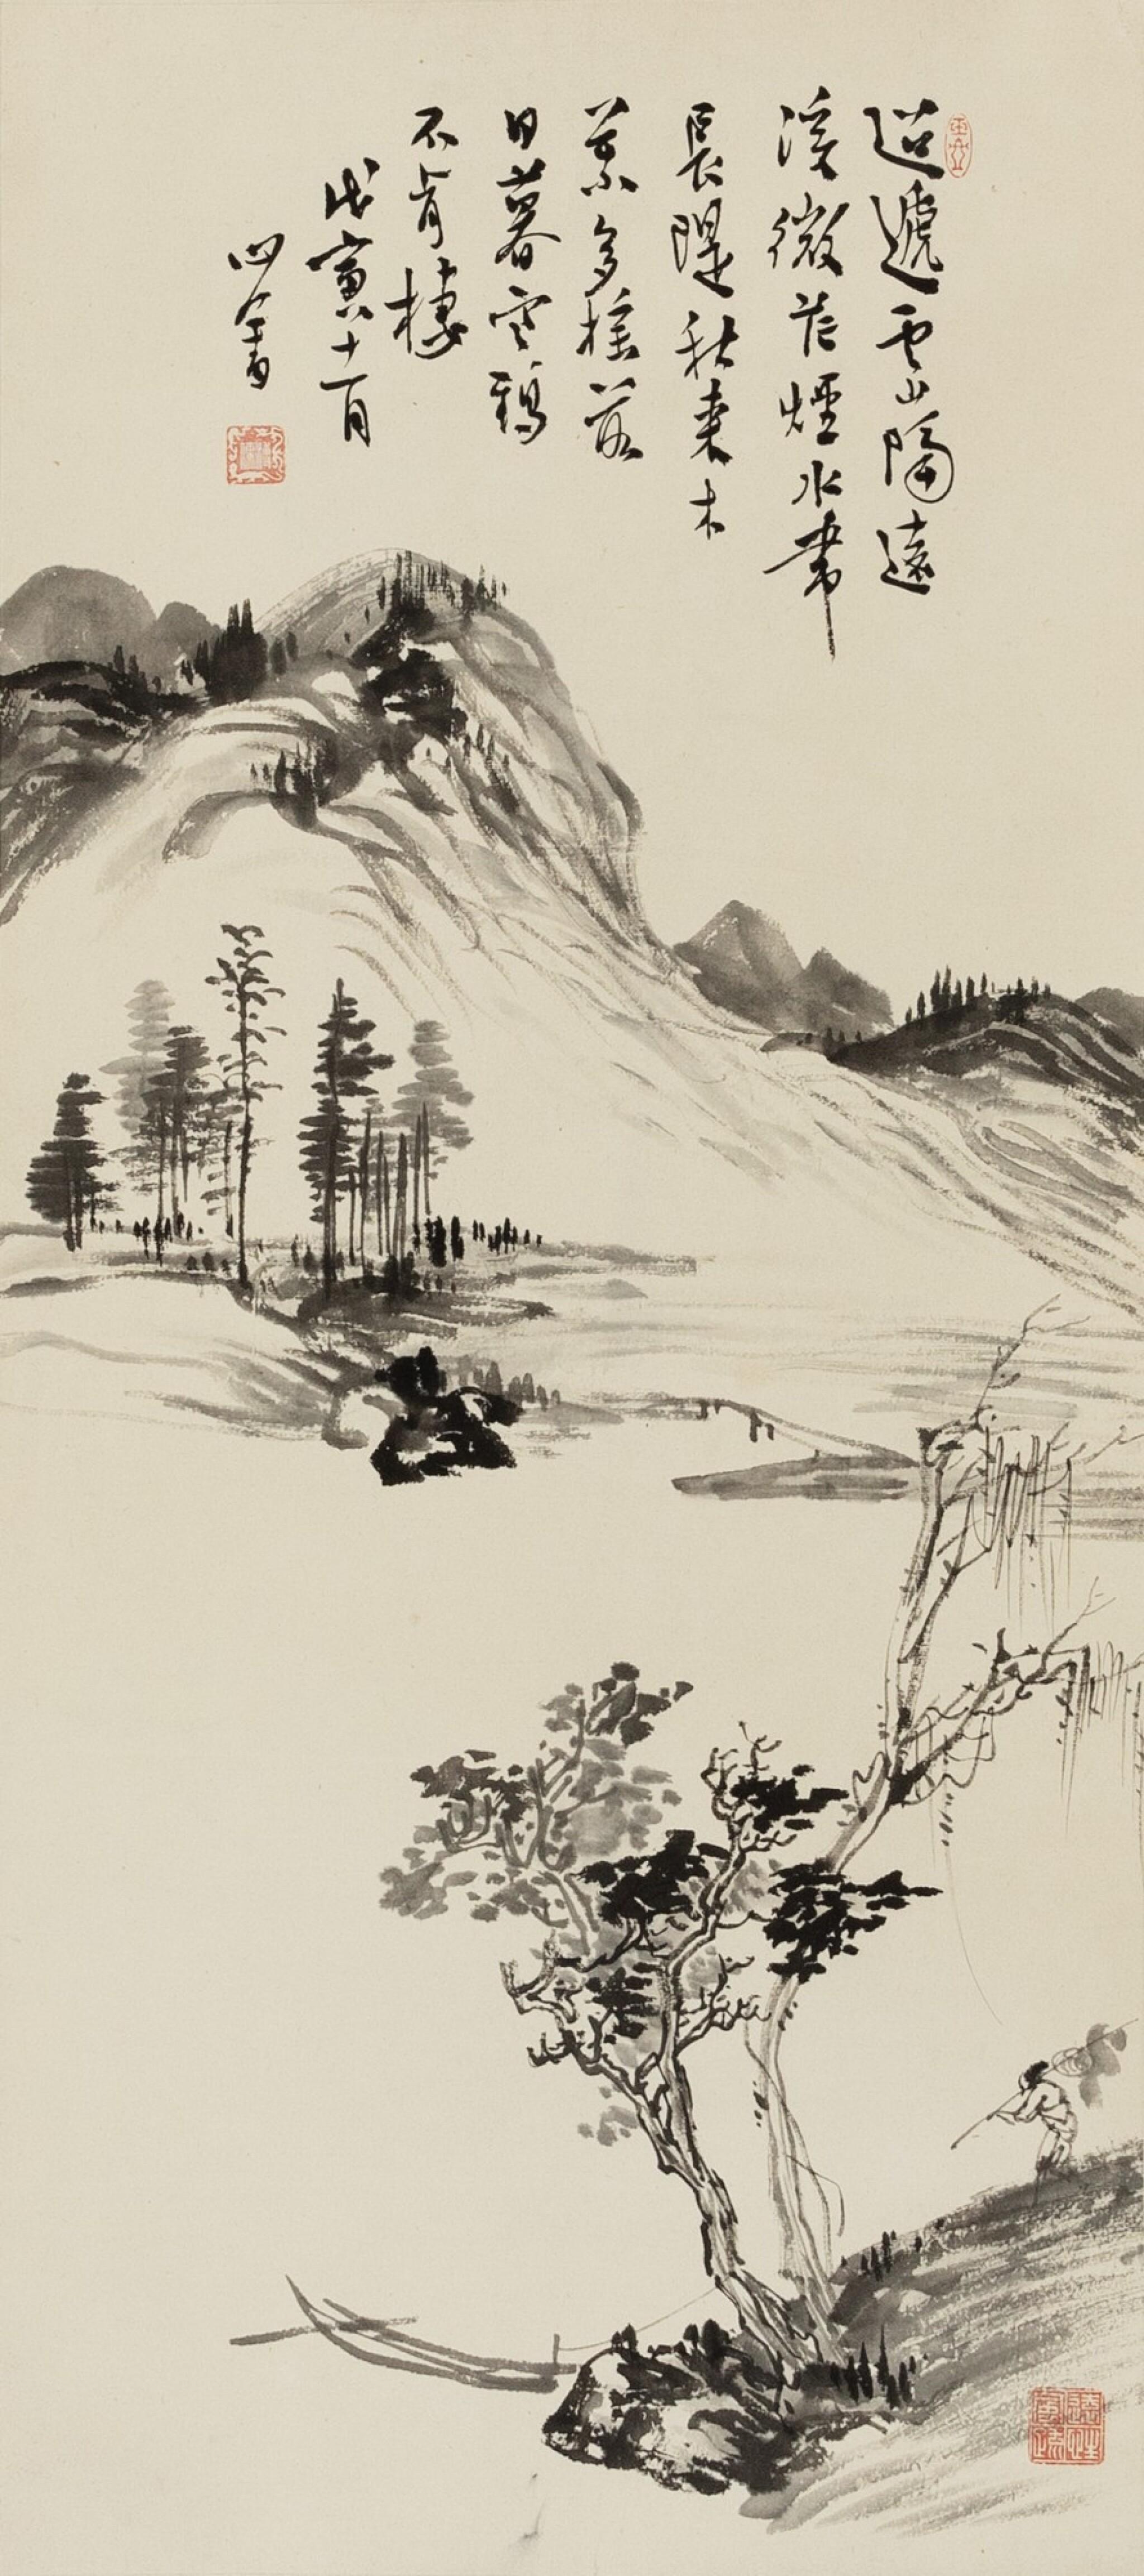 View 1 of Lot 124. Pu Ru (1896-1963) Le retour de pêche  溥儒 漁翁歸渡圖   Pu Ru (1896-1963)  The return from fishing.